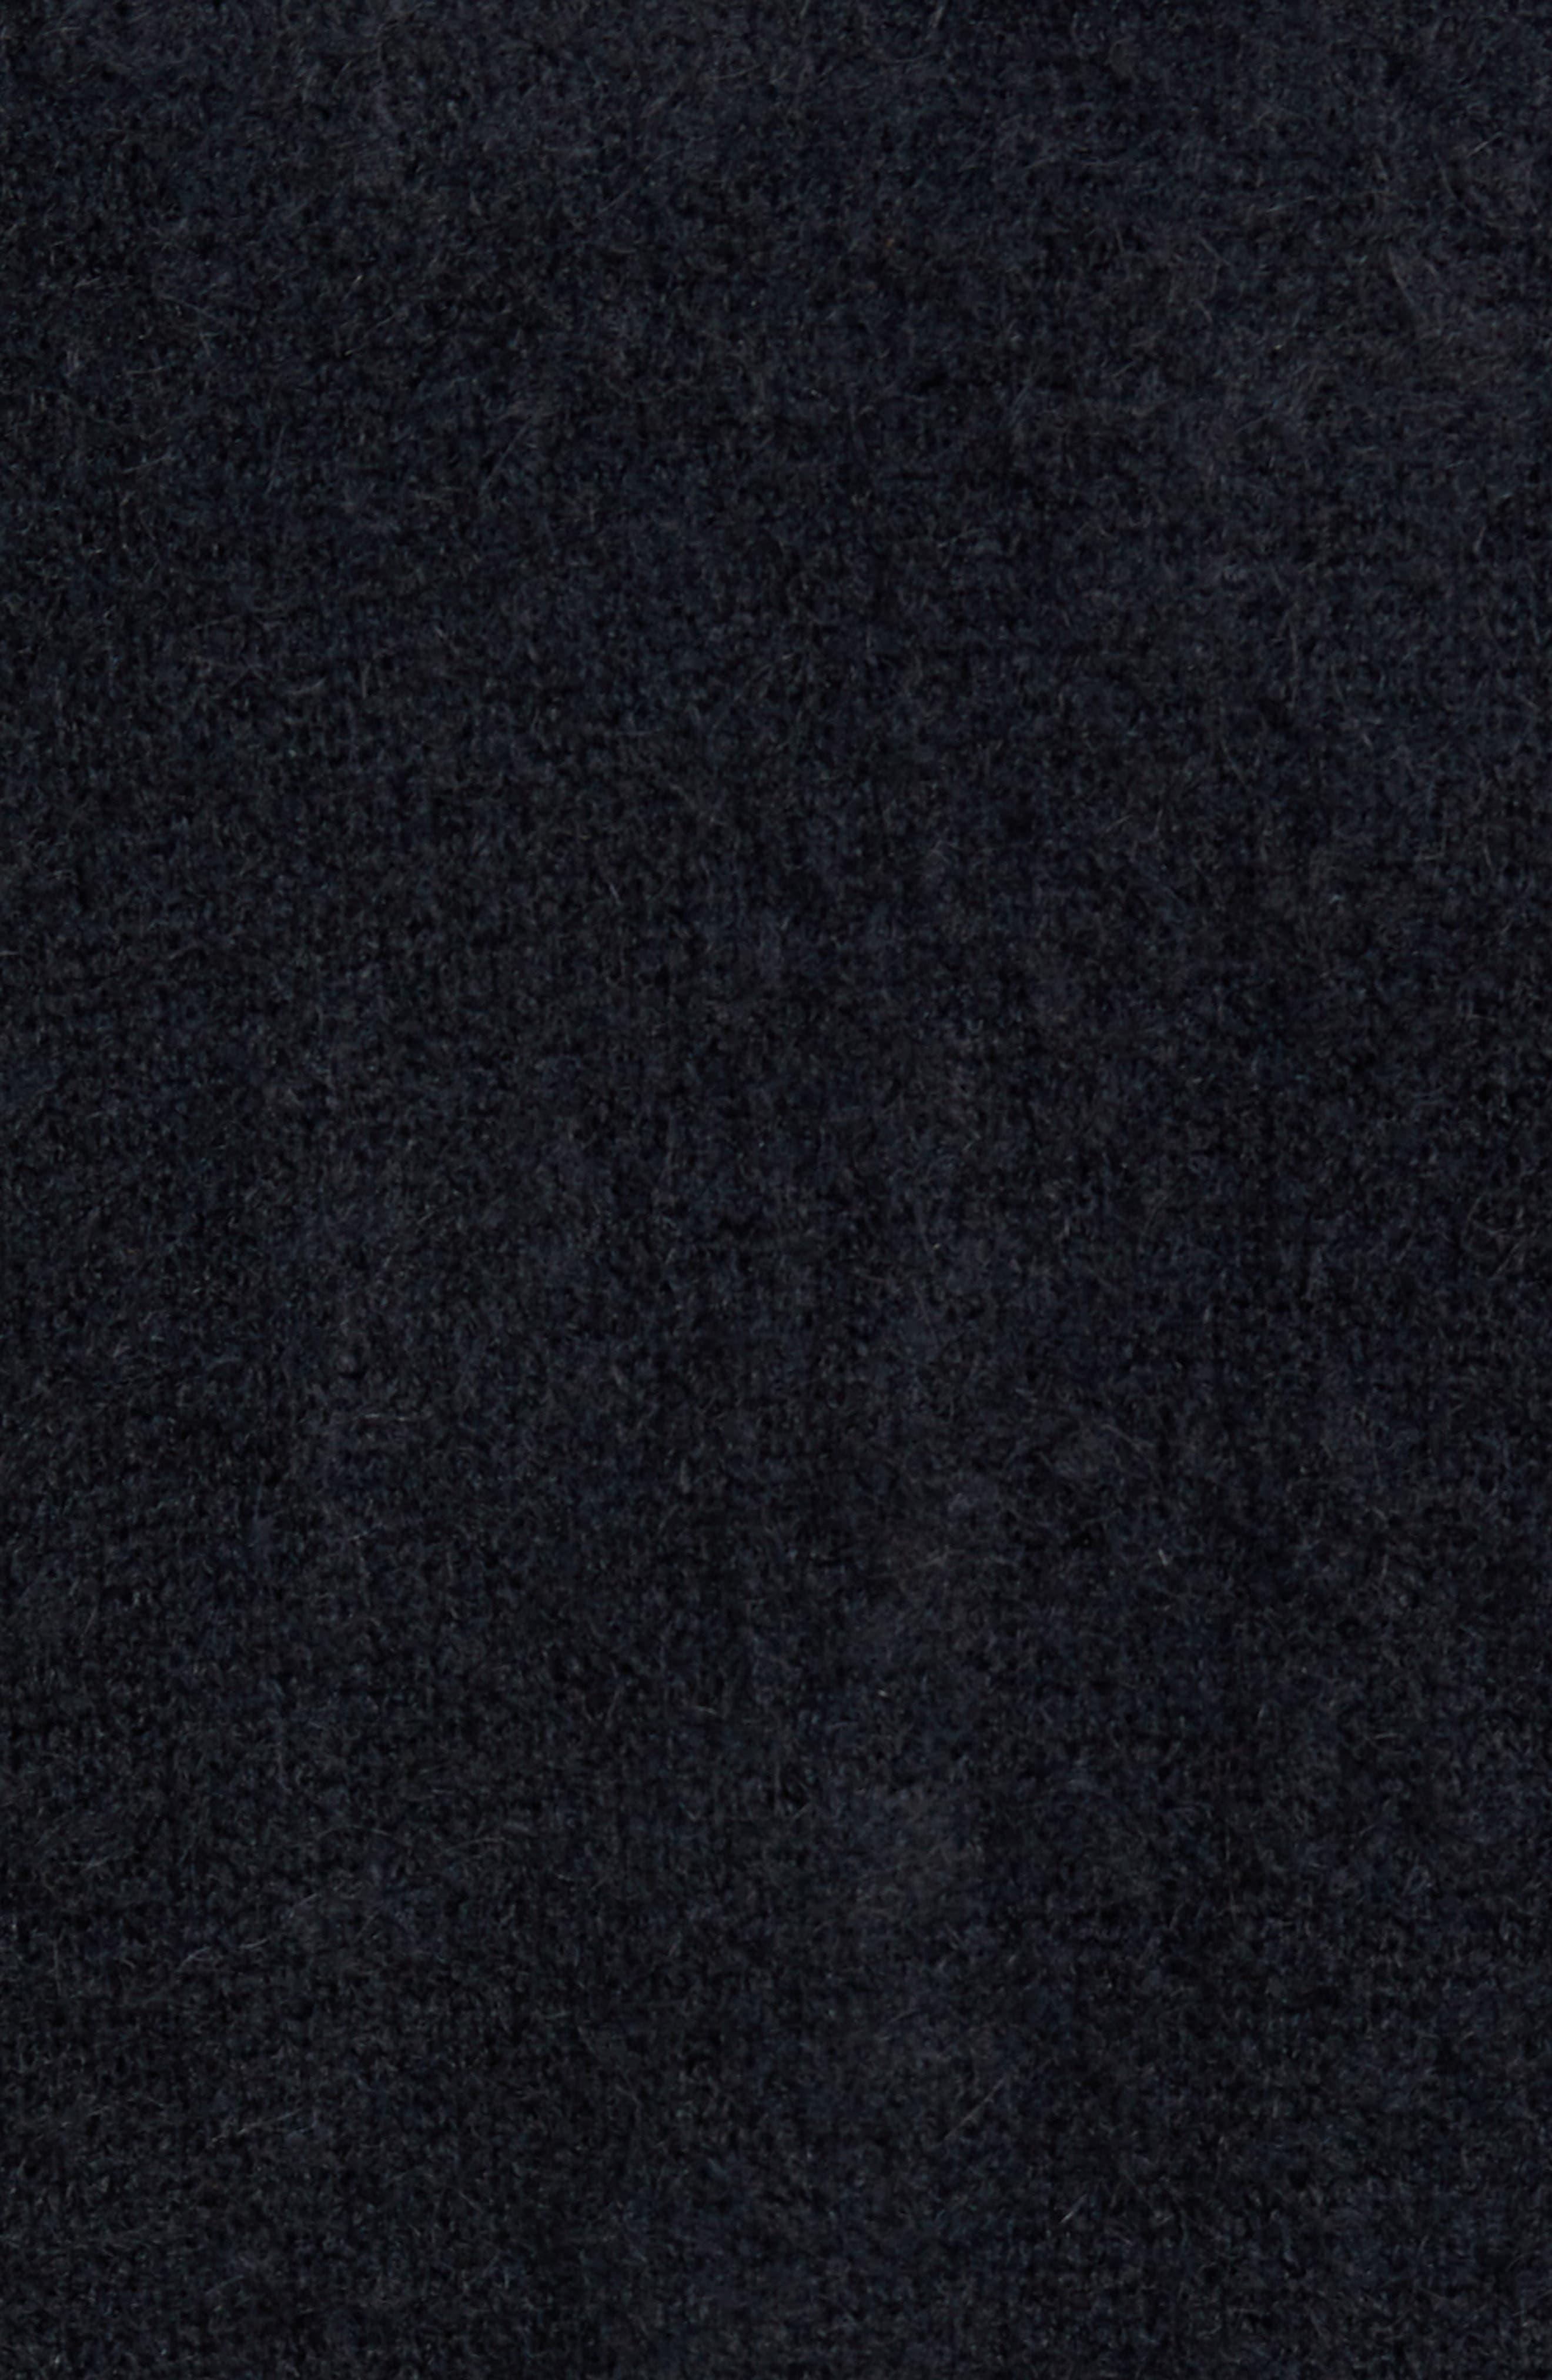 Long Cardigan,                             Alternate thumbnail 5, color,                             BLACK ROCK